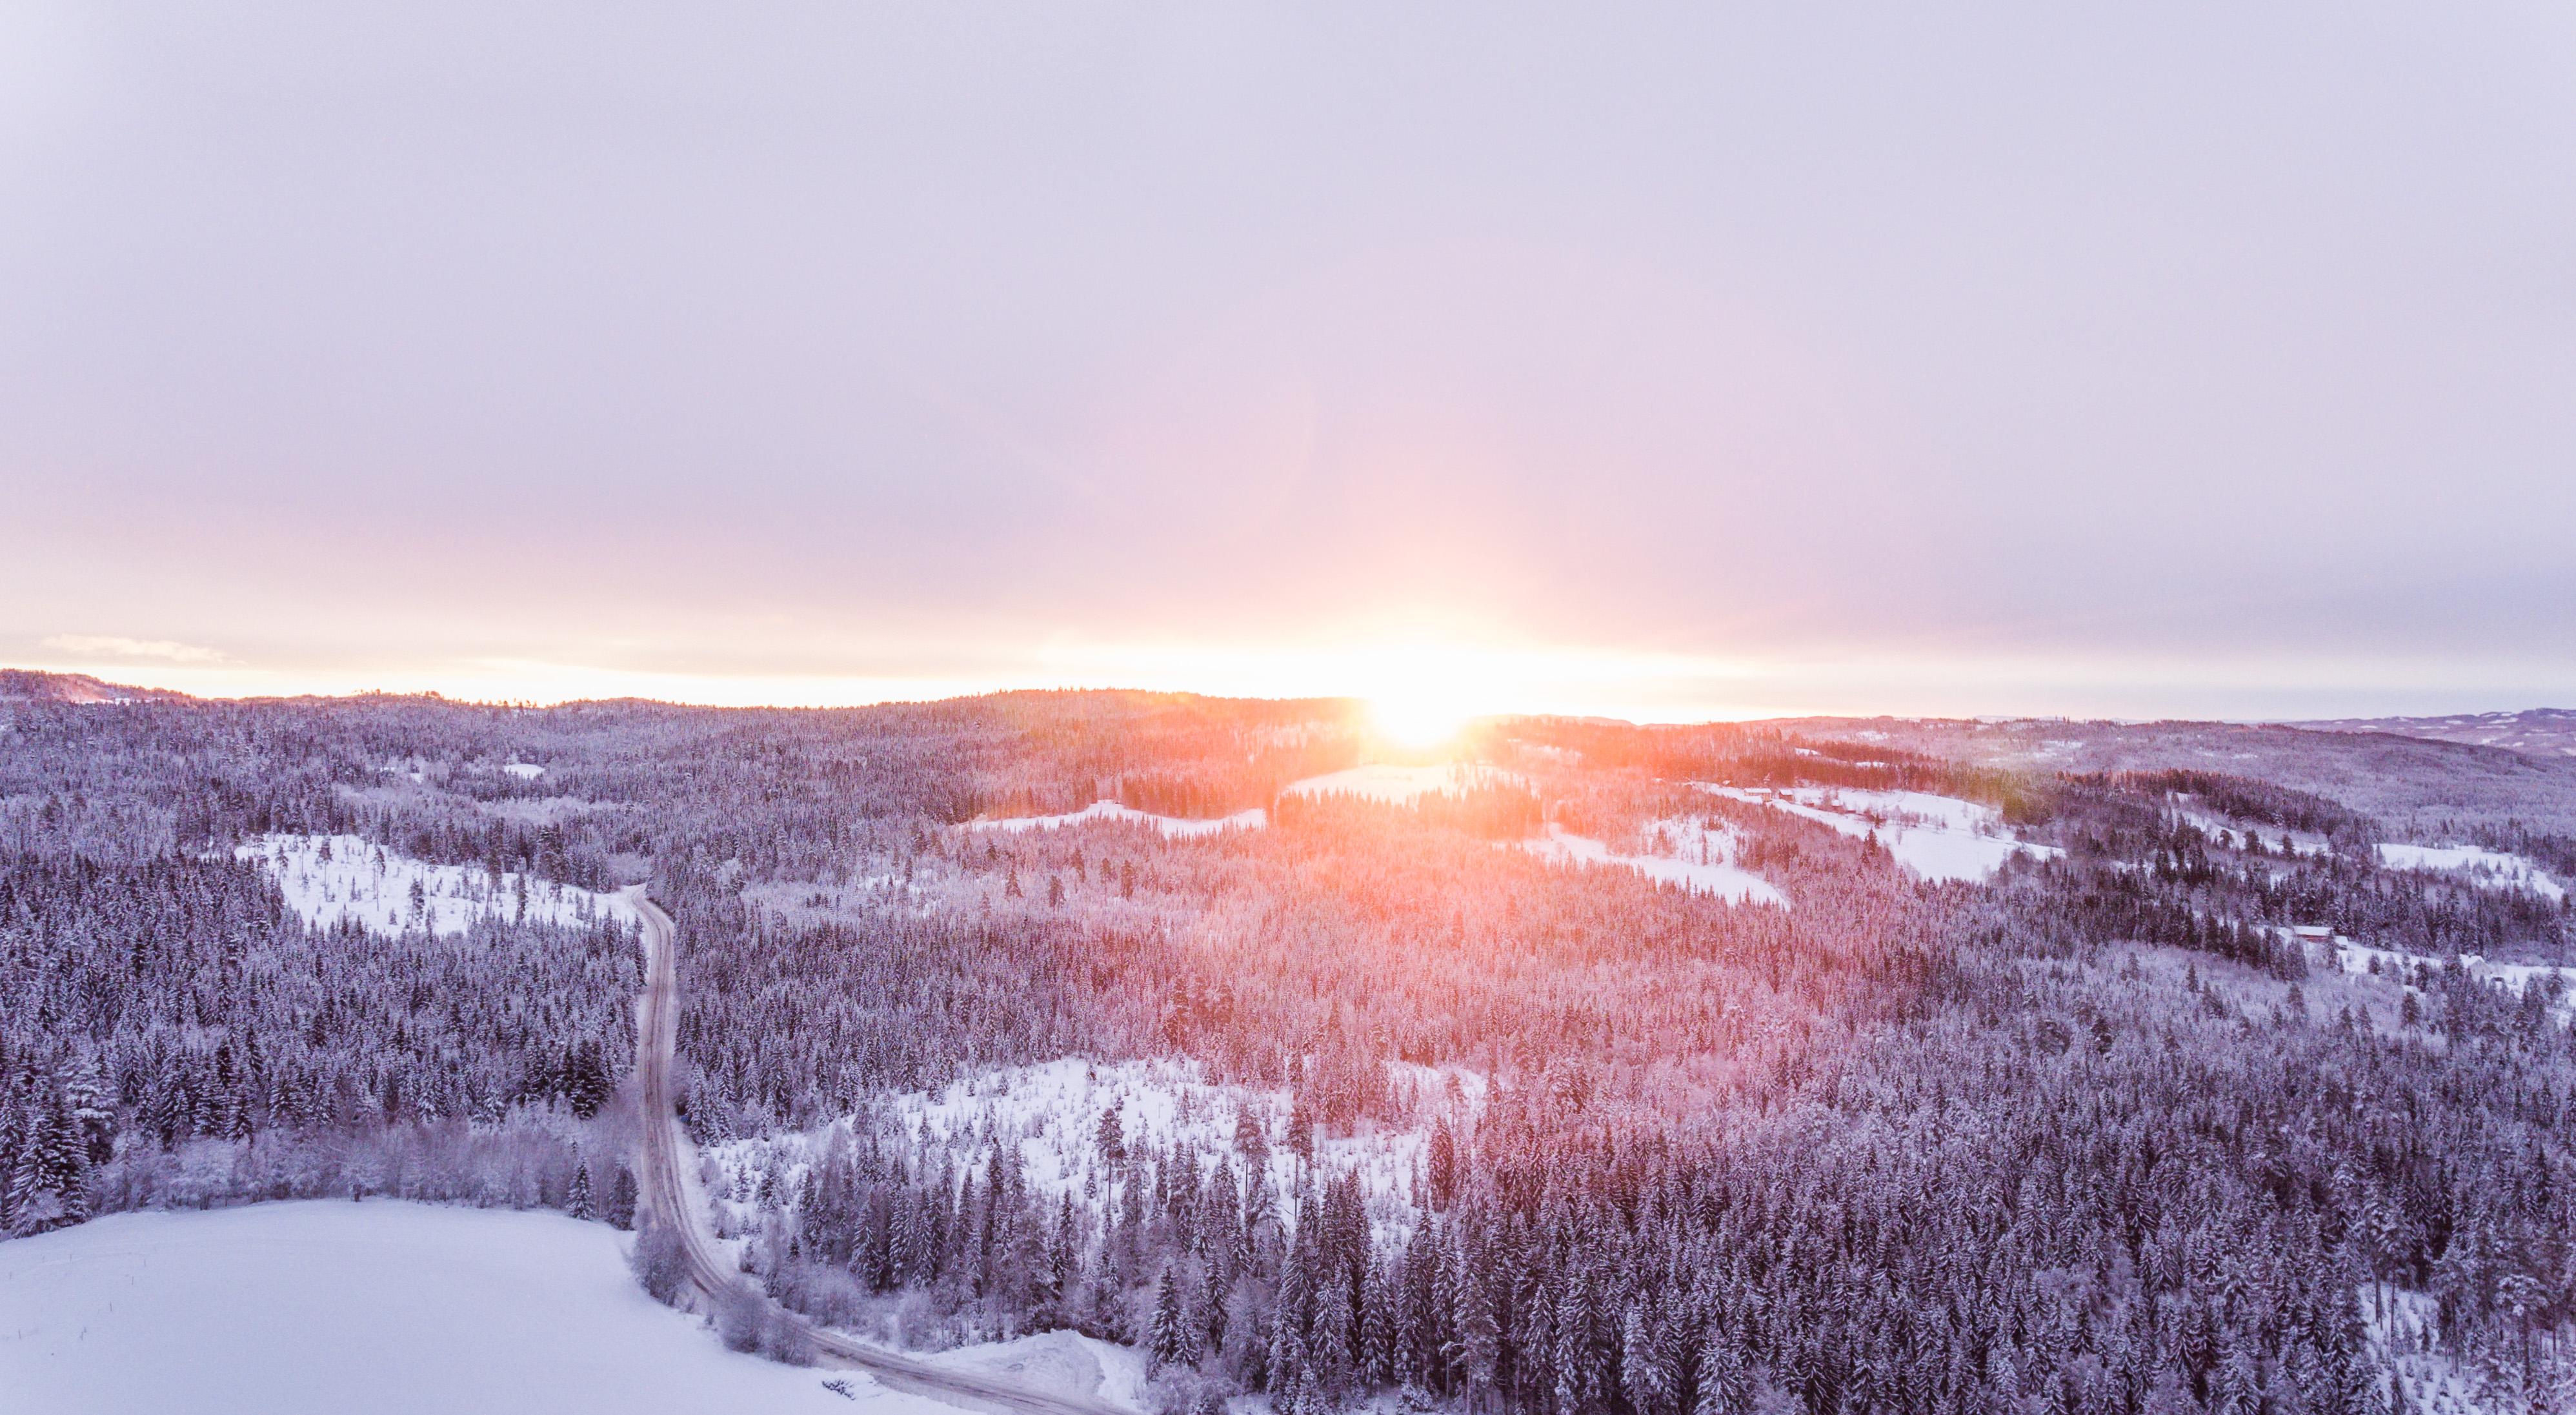 Idyllic Winter Sunrise, Scenic, Season, Scenery, Outdoor, HQ Photo